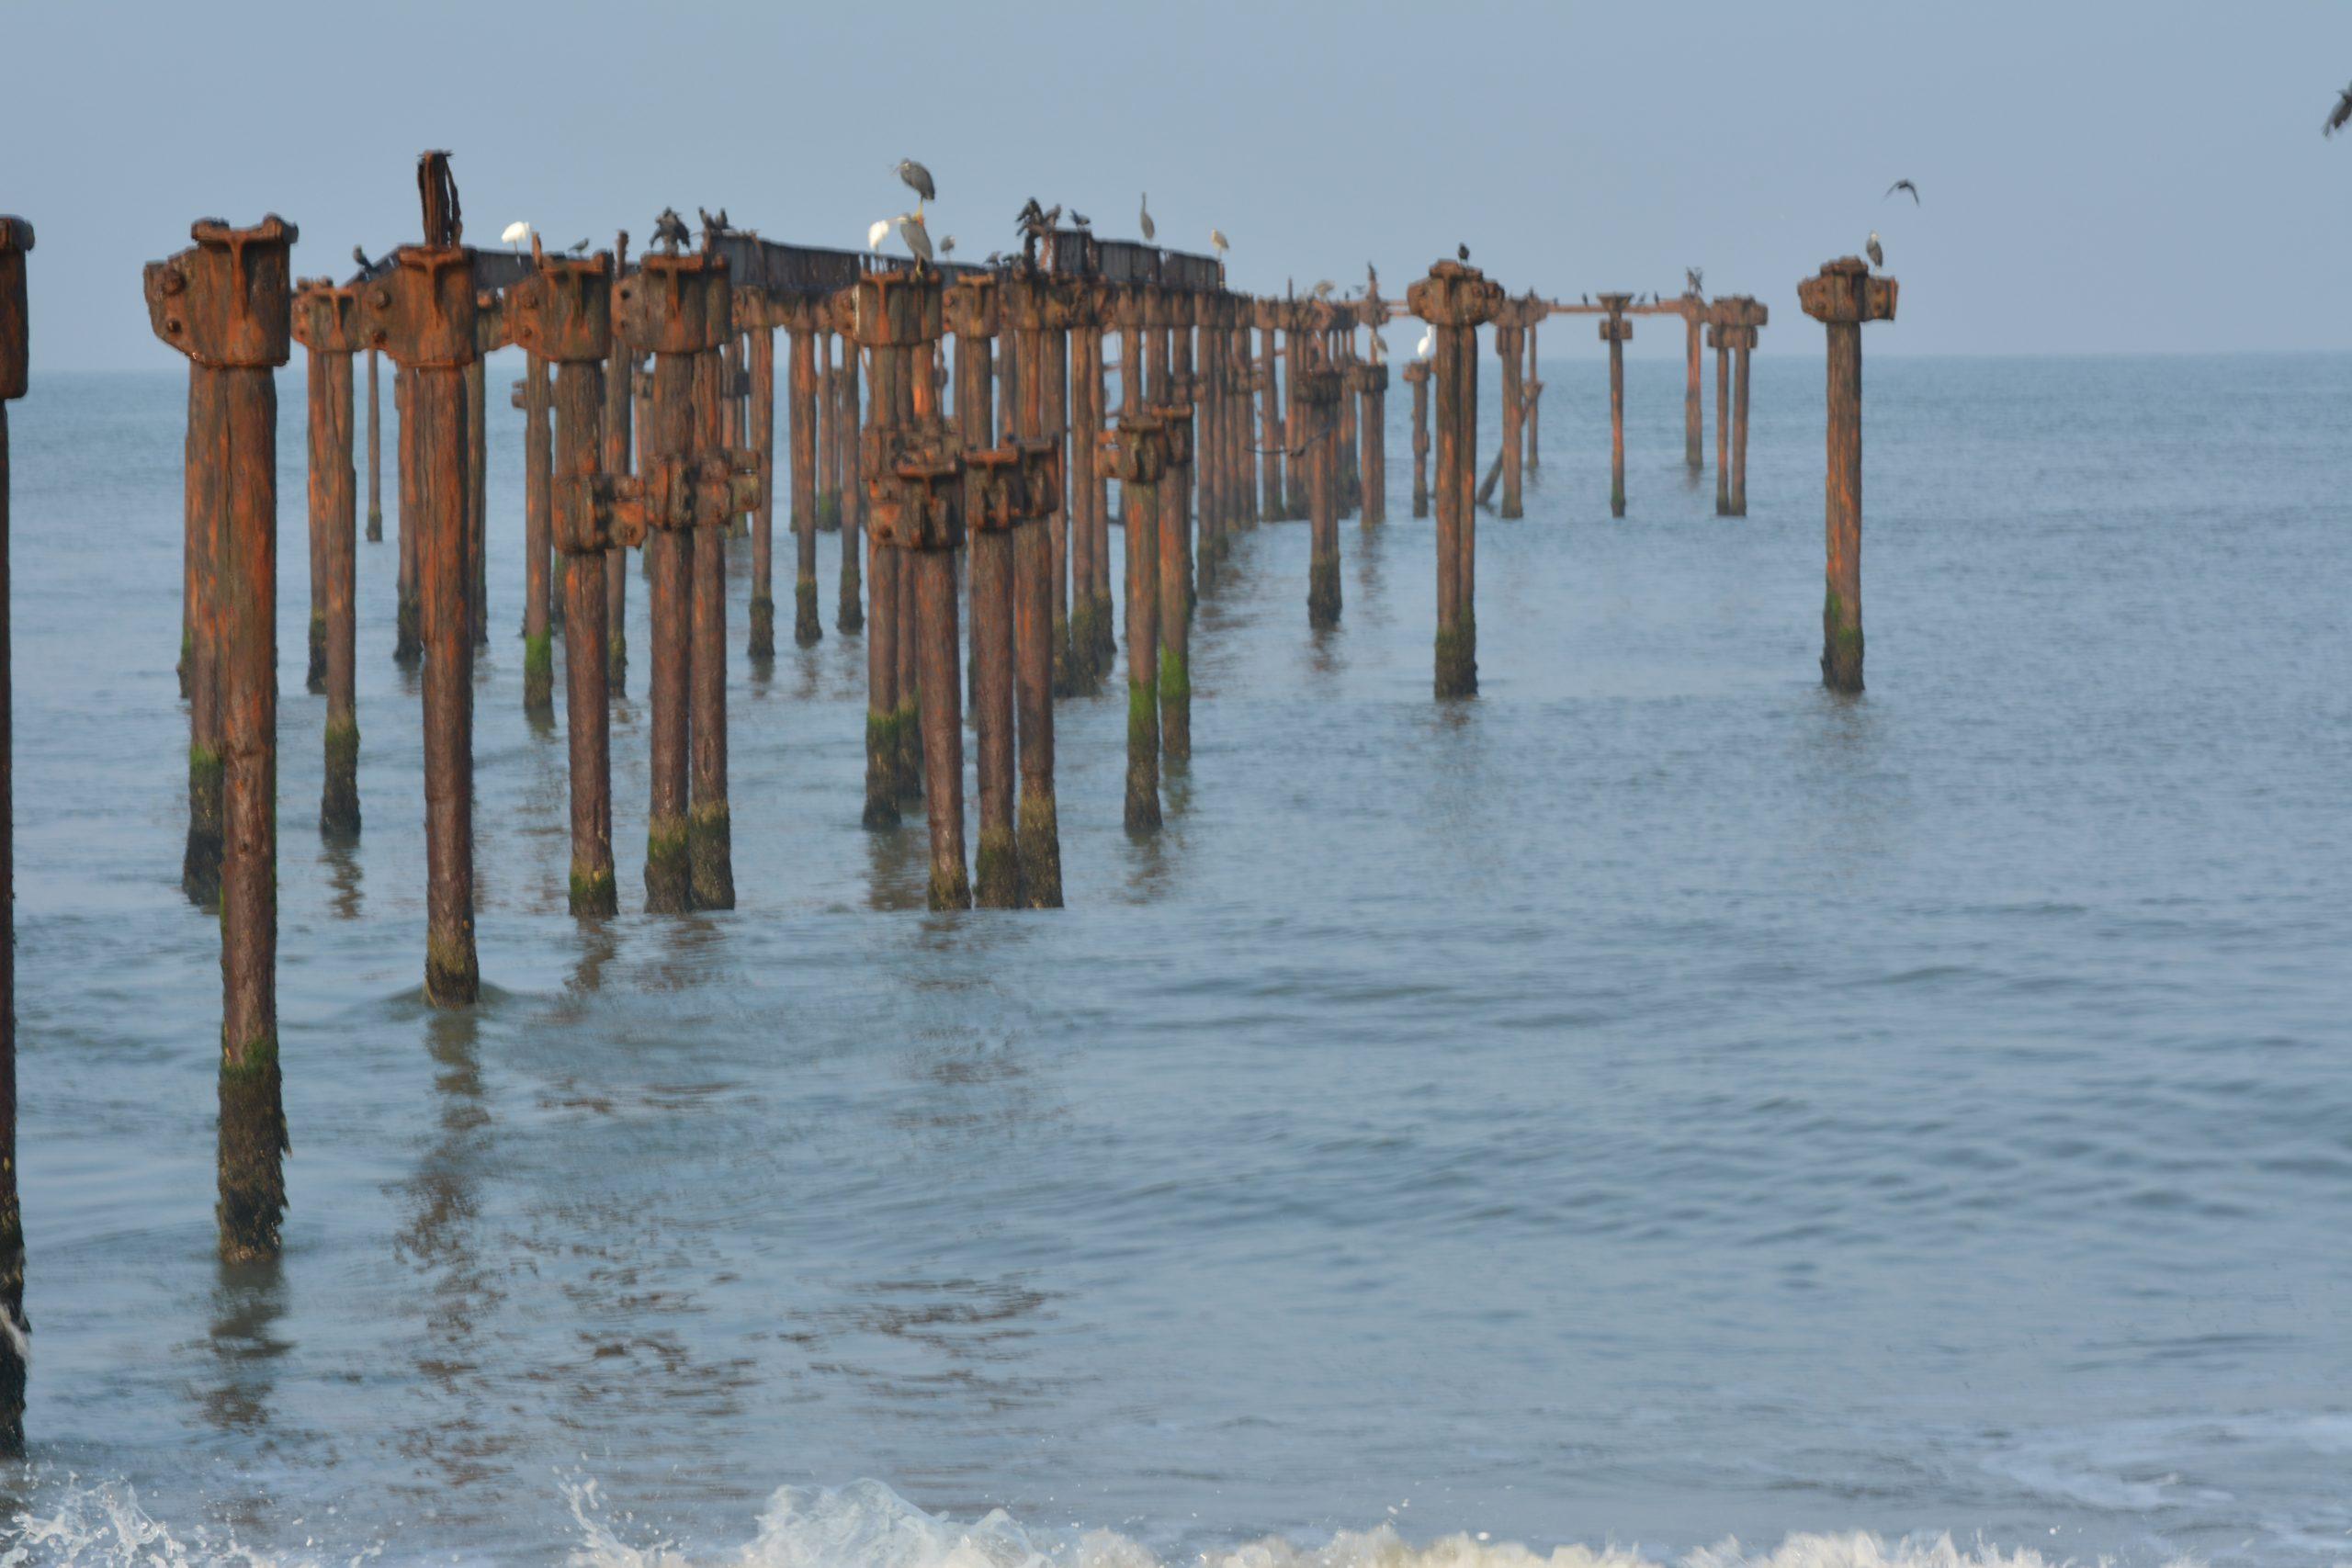 Poles in sea water